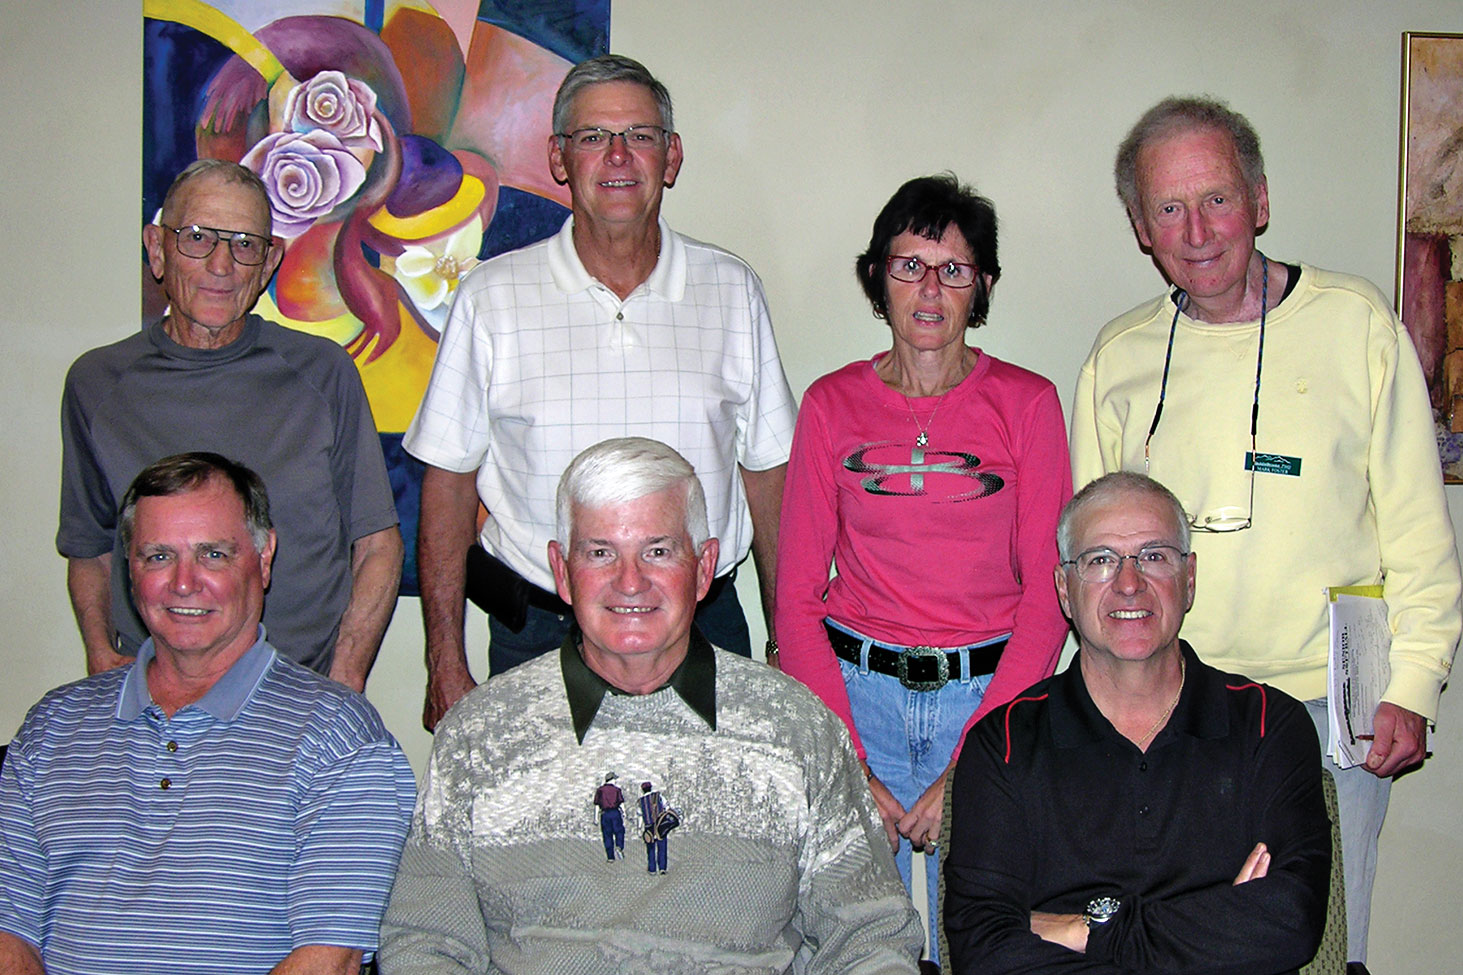 2016 SSSA Board, back row: Jack Graef, Steve Garceau, Debbie Seguin and Mark Foster; front row: Ken Crossman, Stu Kraft and Charlie LaNeve. Photo by Pat Tiefenbach